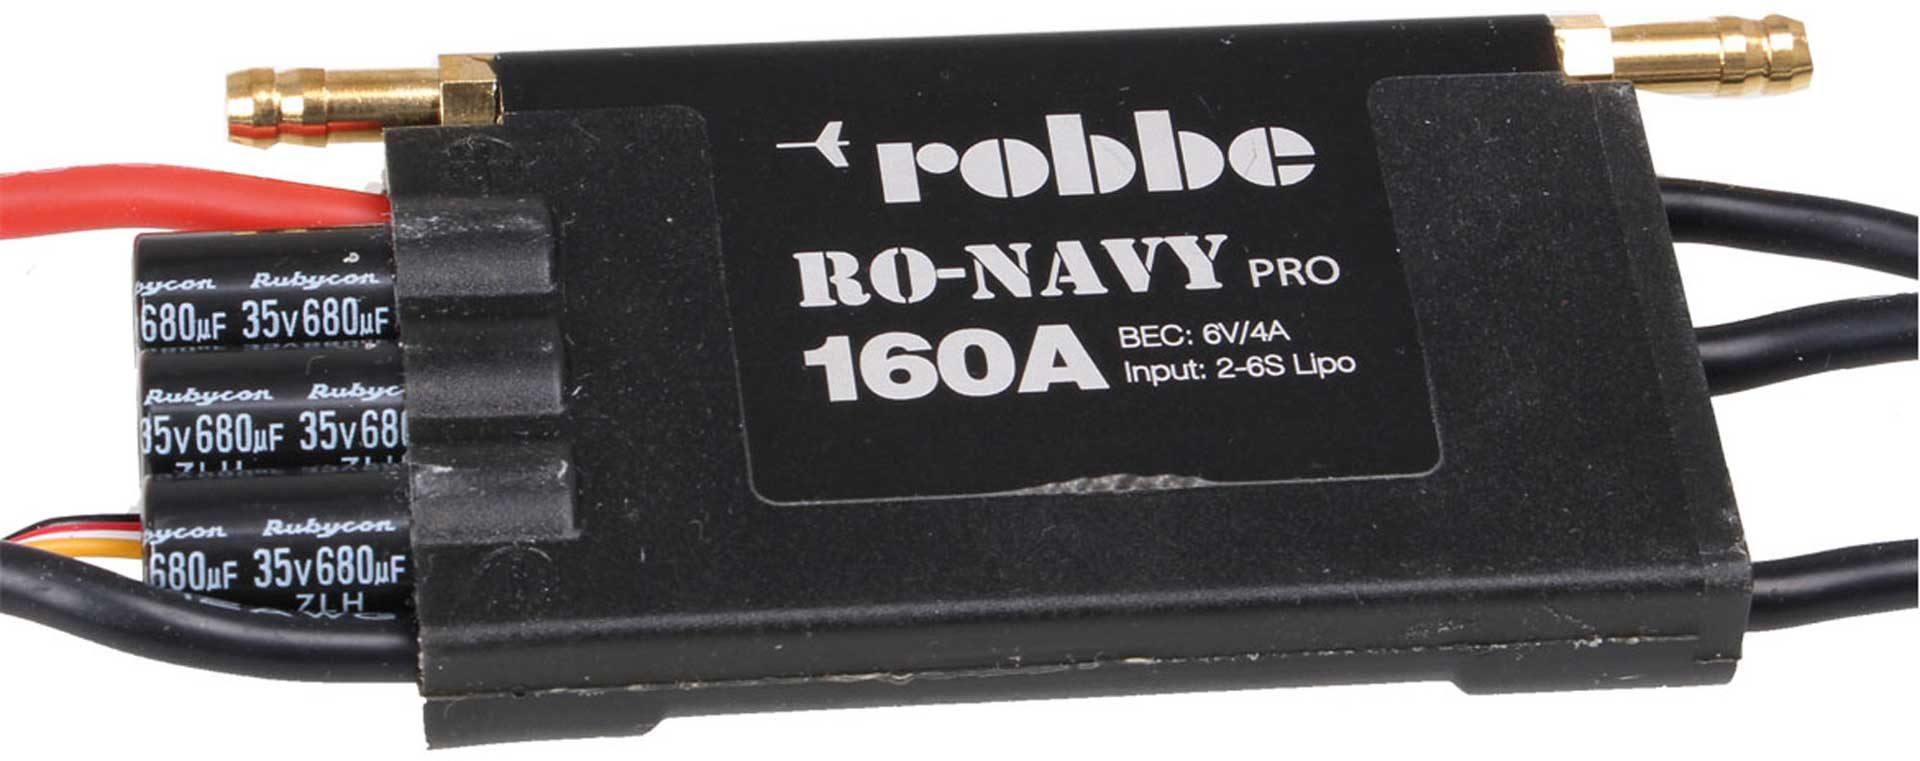 Robbe Modellsport RO-CONTROL NAVY PRO 6-160 2-6S -160A BEC